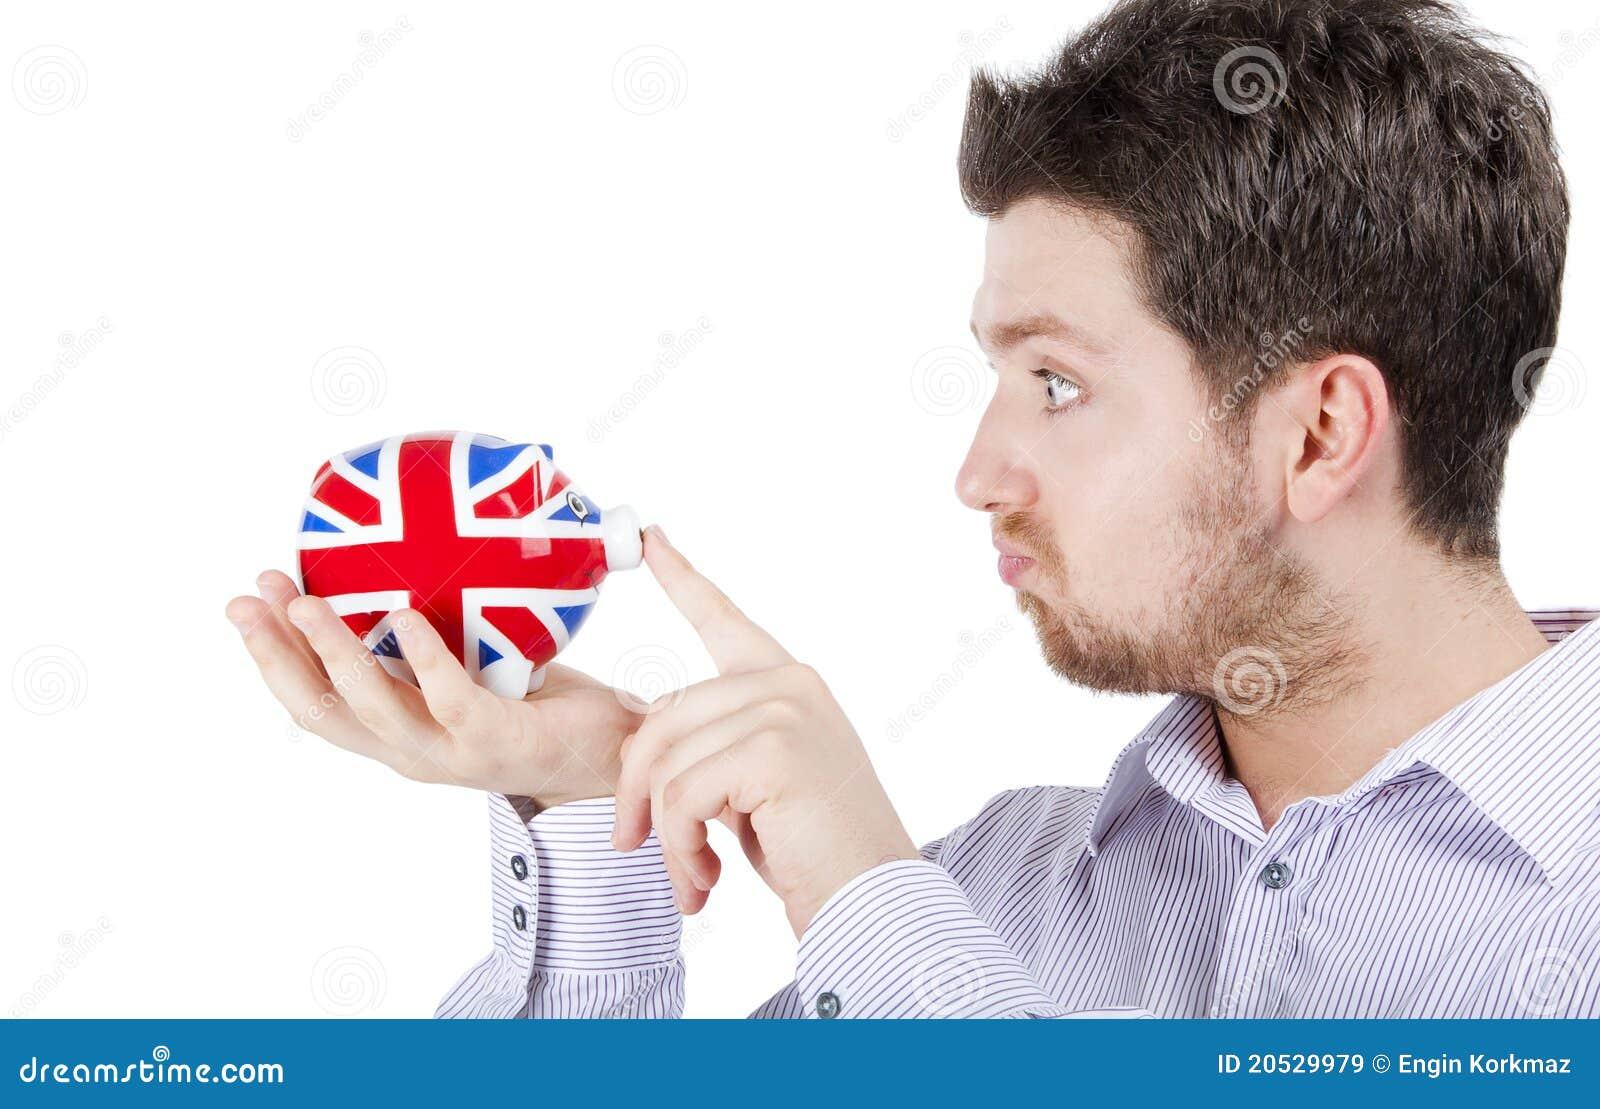 British man playing with piggy bank